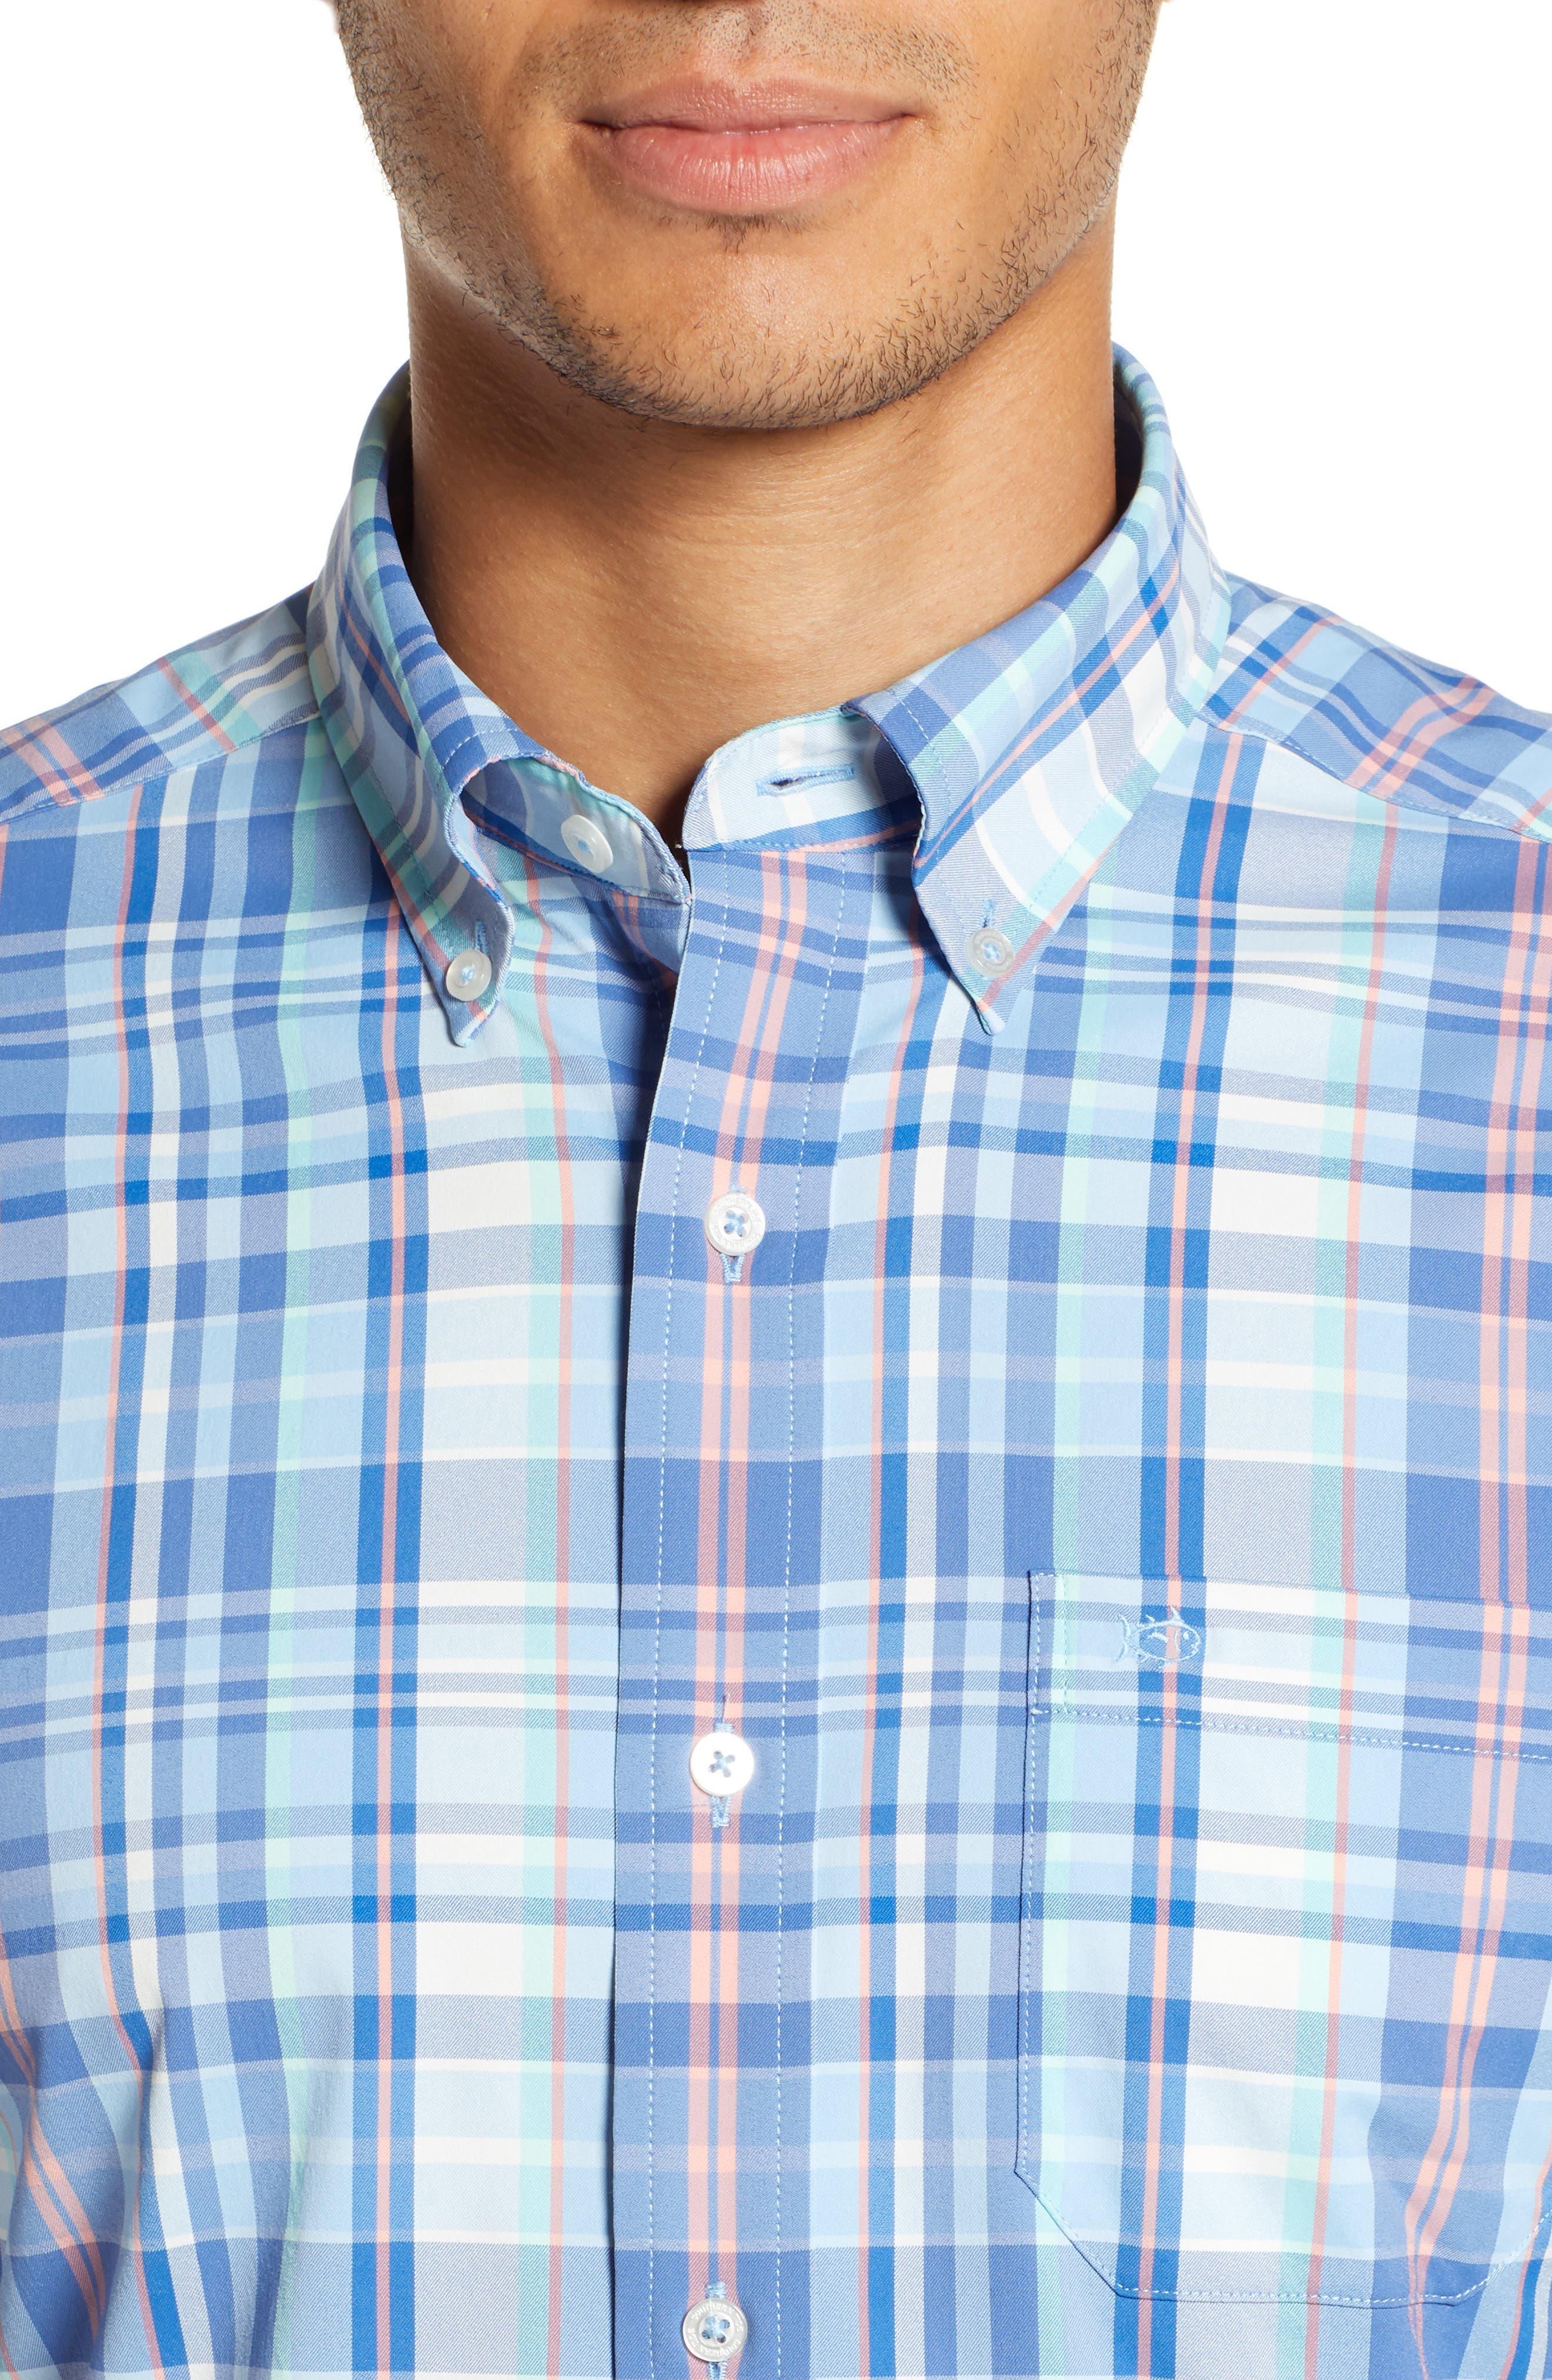 Siesta Intercoastal Regular Fit Plaid Performance Sport Shirt,                             Alternate thumbnail 2, color,                             SKY BLUE